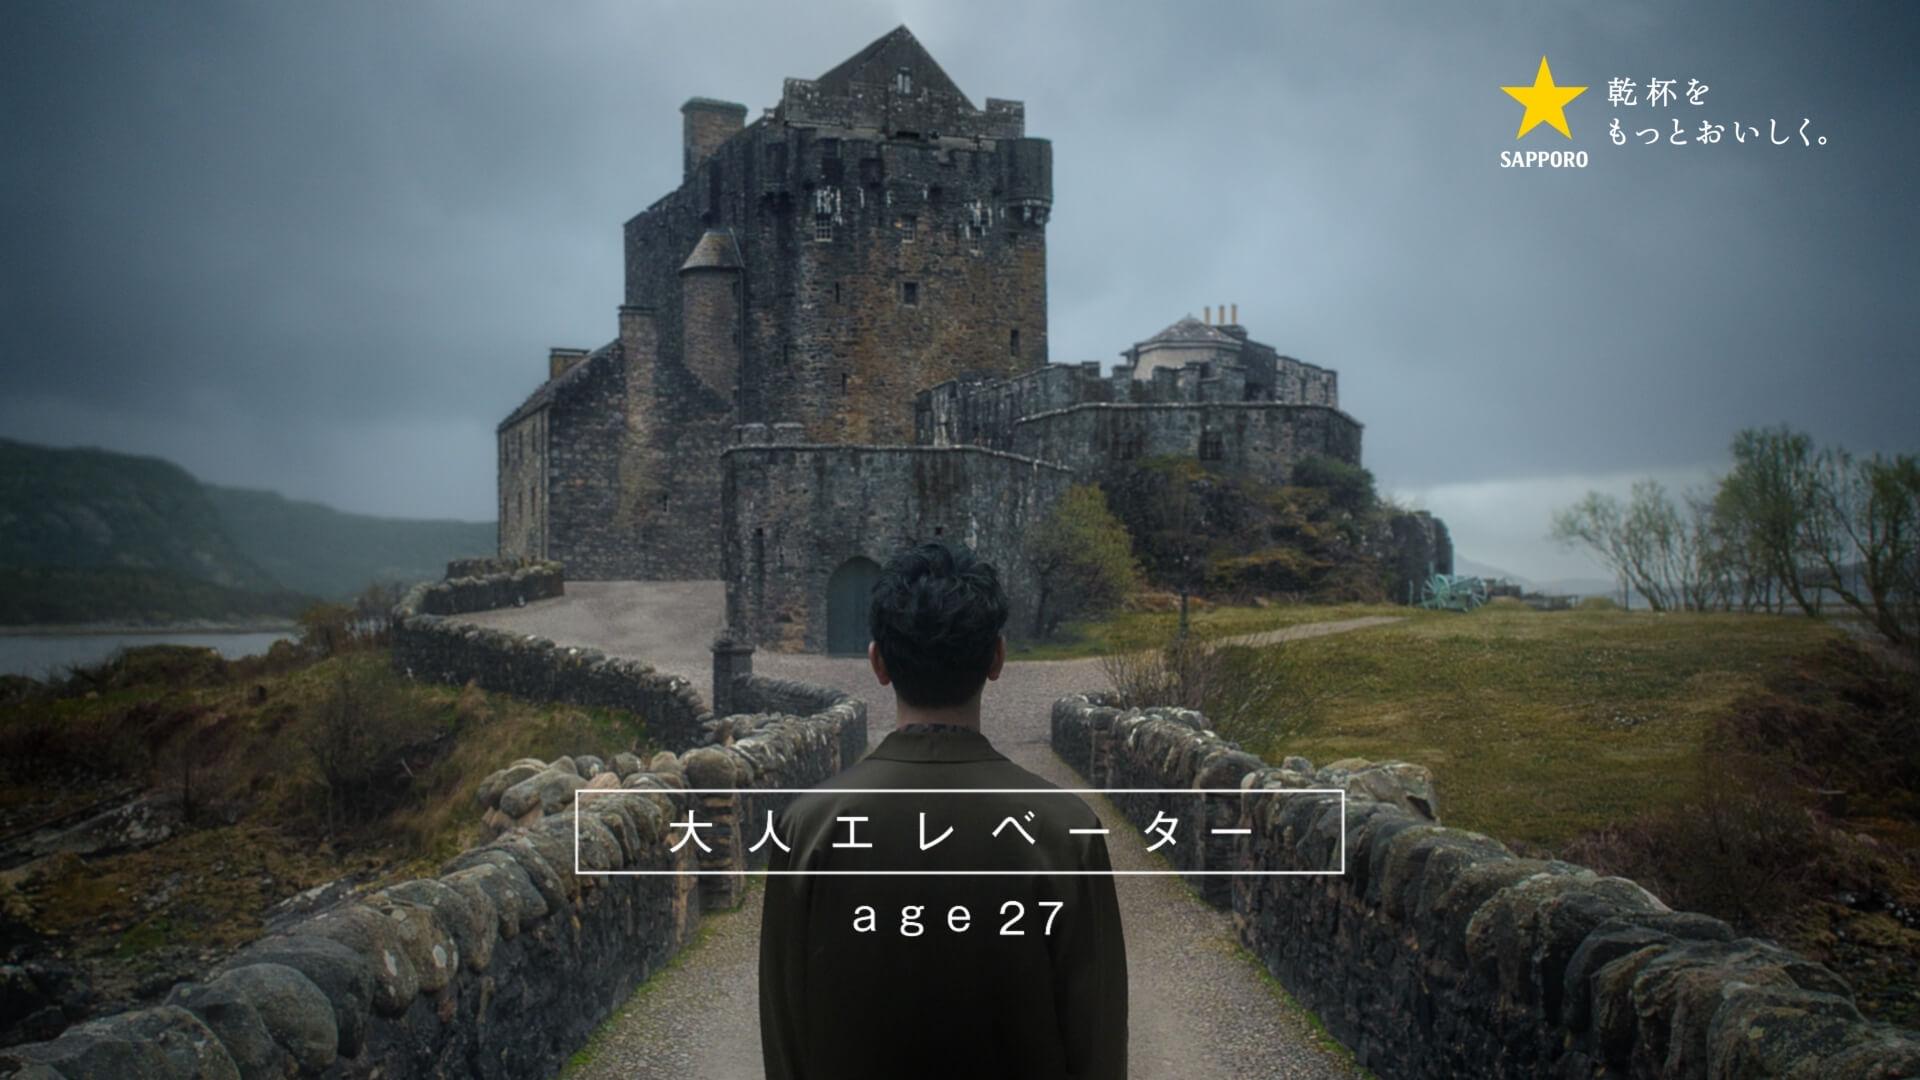 King Gnu常田大希が音楽について語るサッポロビールのCM新バージョンが放映決定!ホームページで特別メッセージムービーも公開 art200707_tsunetadaiki_beer_10